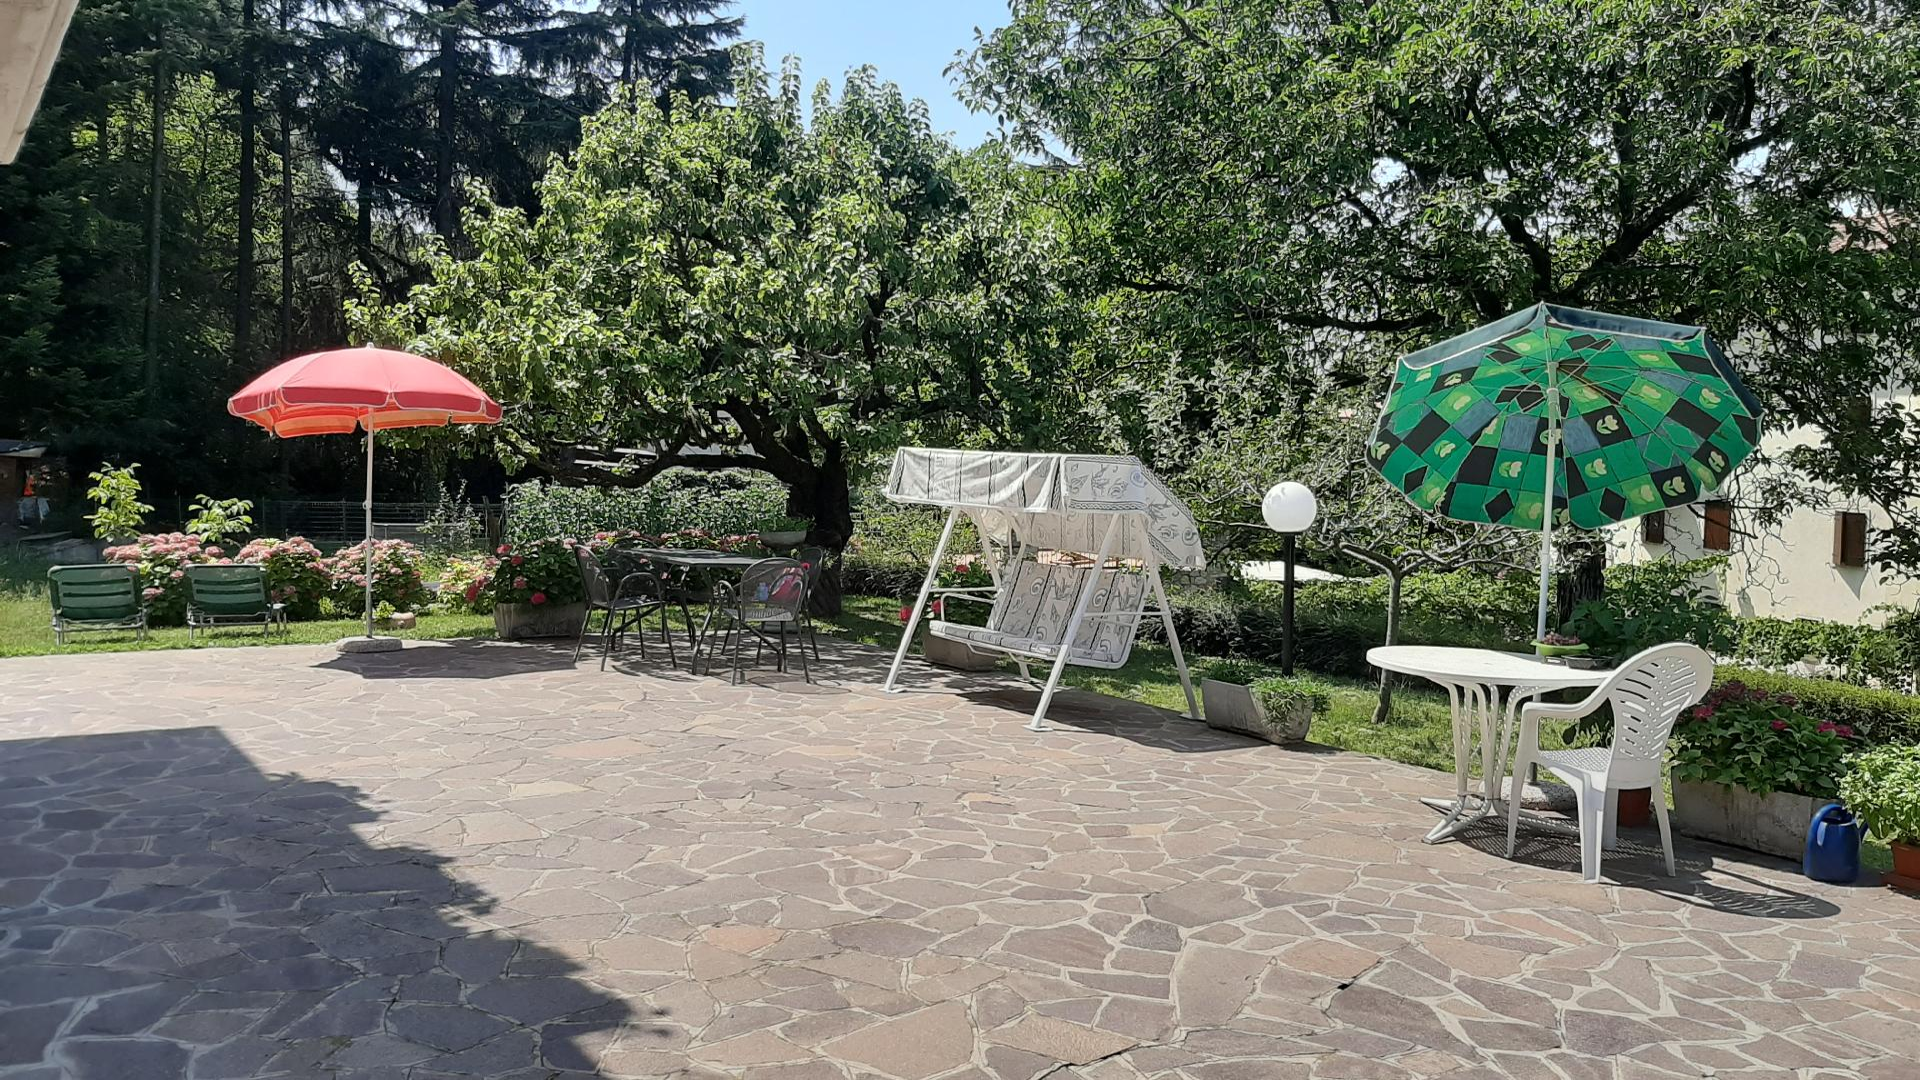 Ferienwohnung für 6 Personen ca. 70 m² i   San Zeno di Montagna